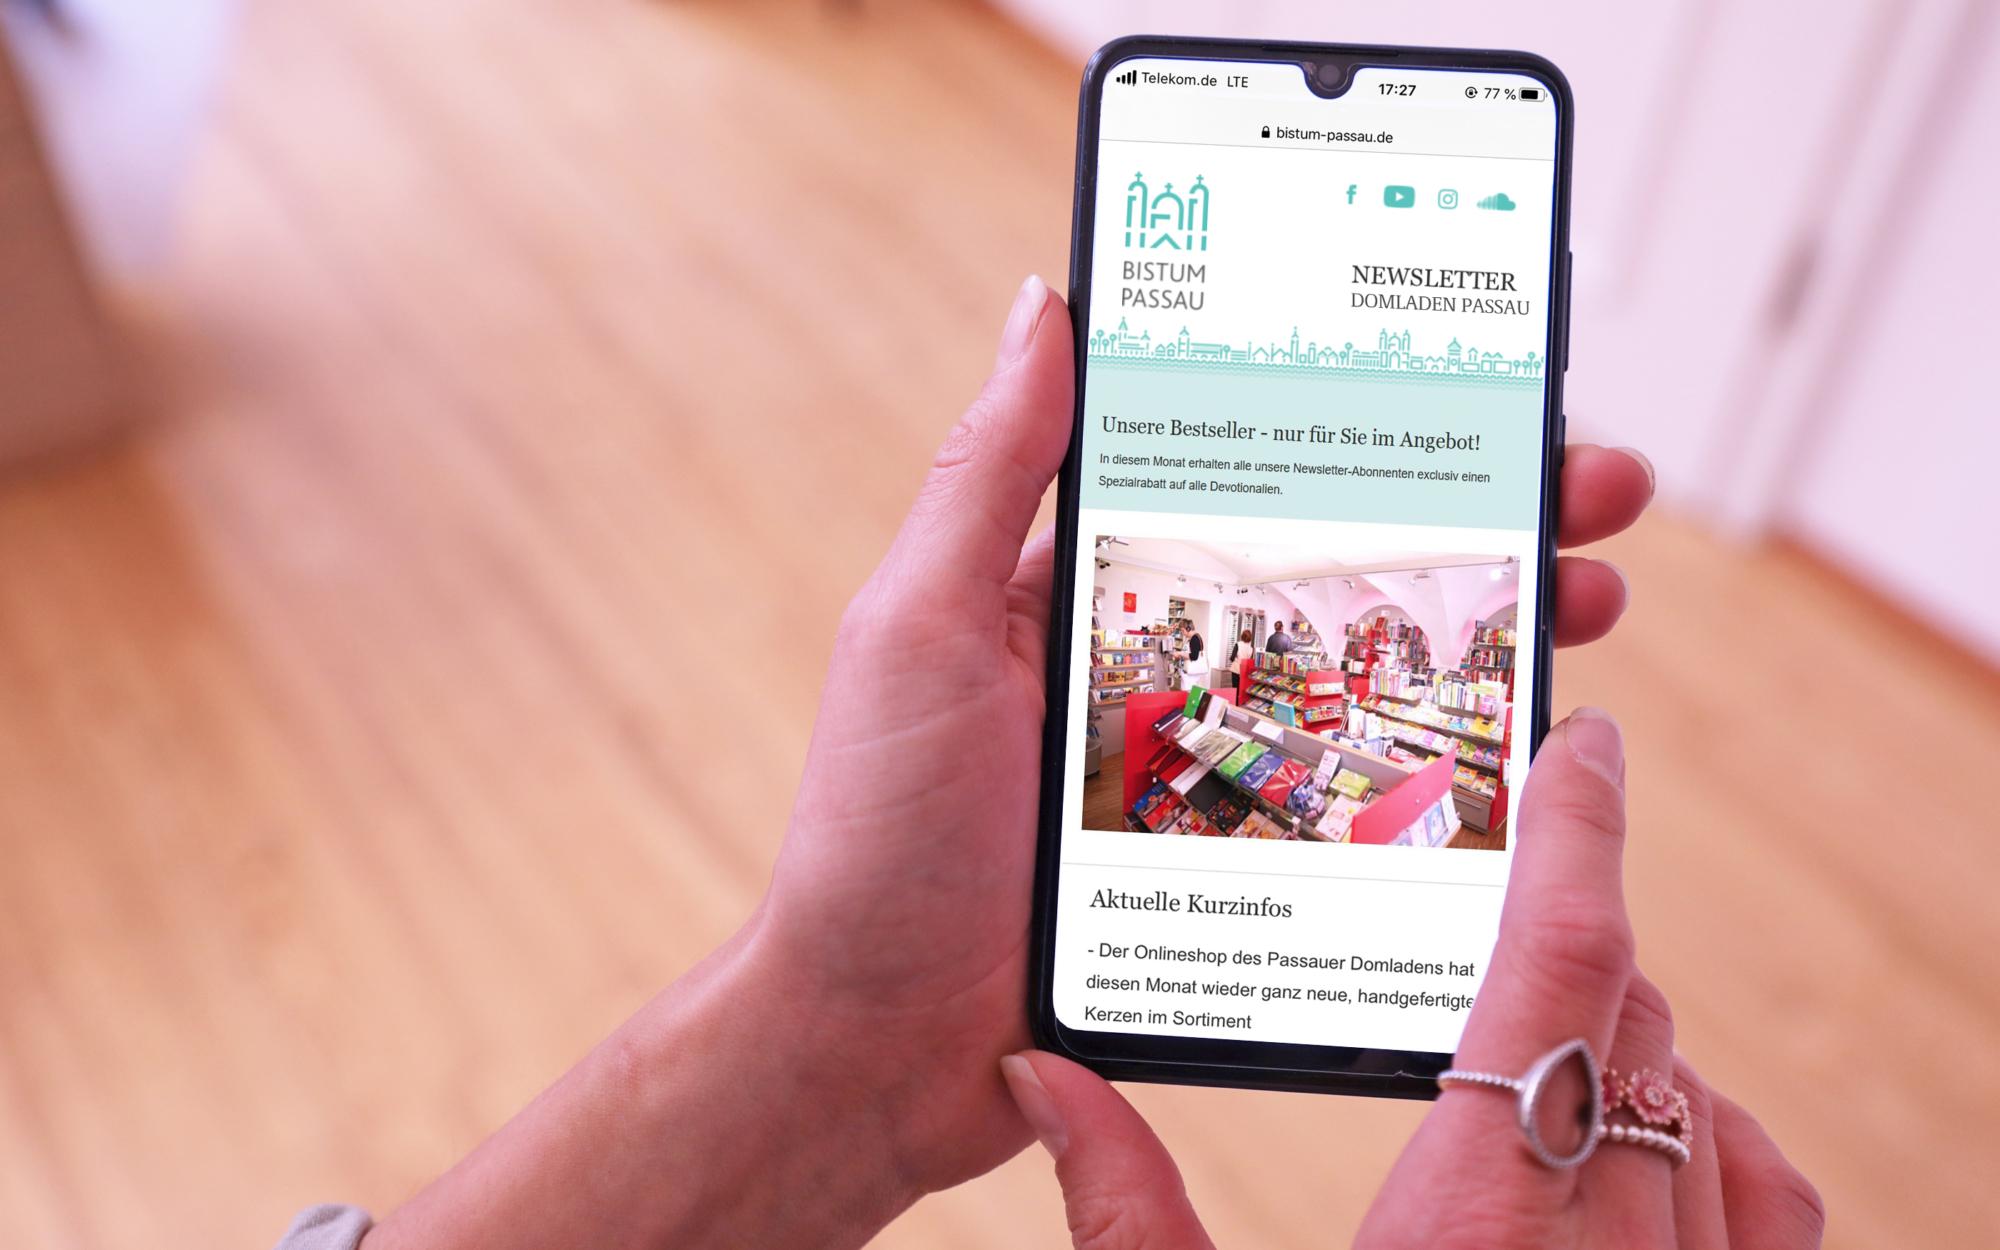 Newsletter Smartphone Domladen